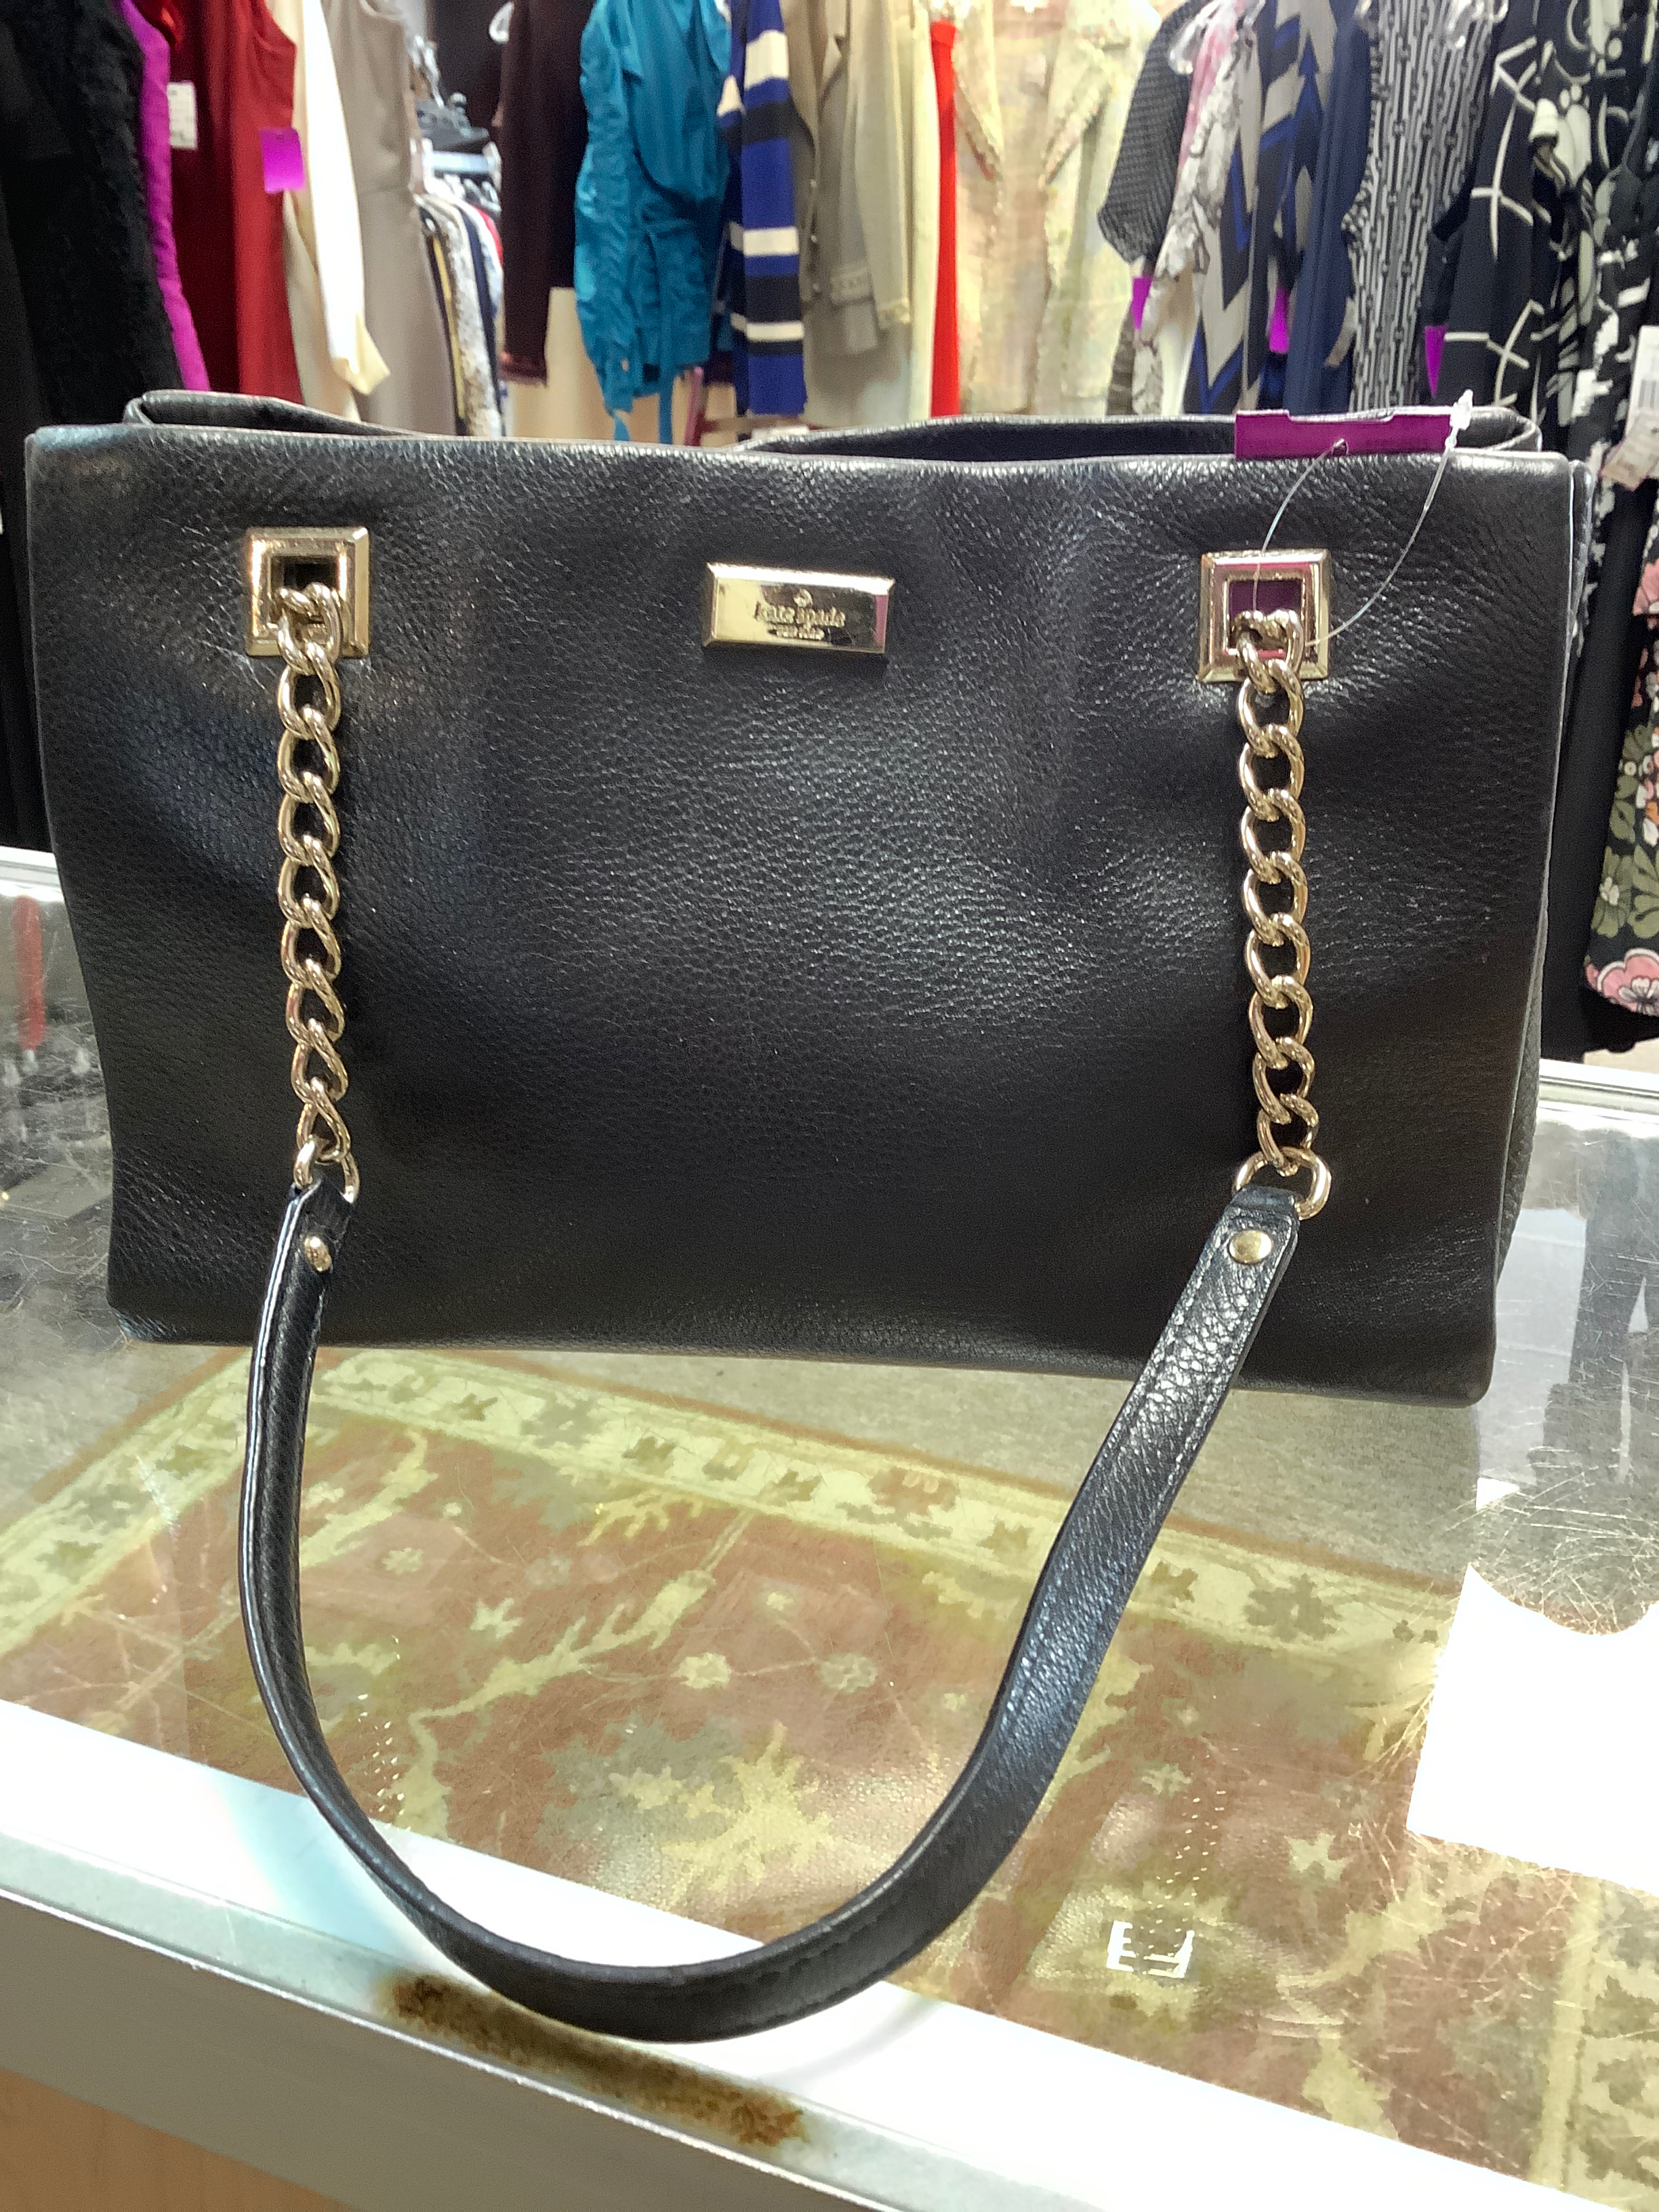 Kate-Spade-Black-Solid-Handbag_234419A.jpg